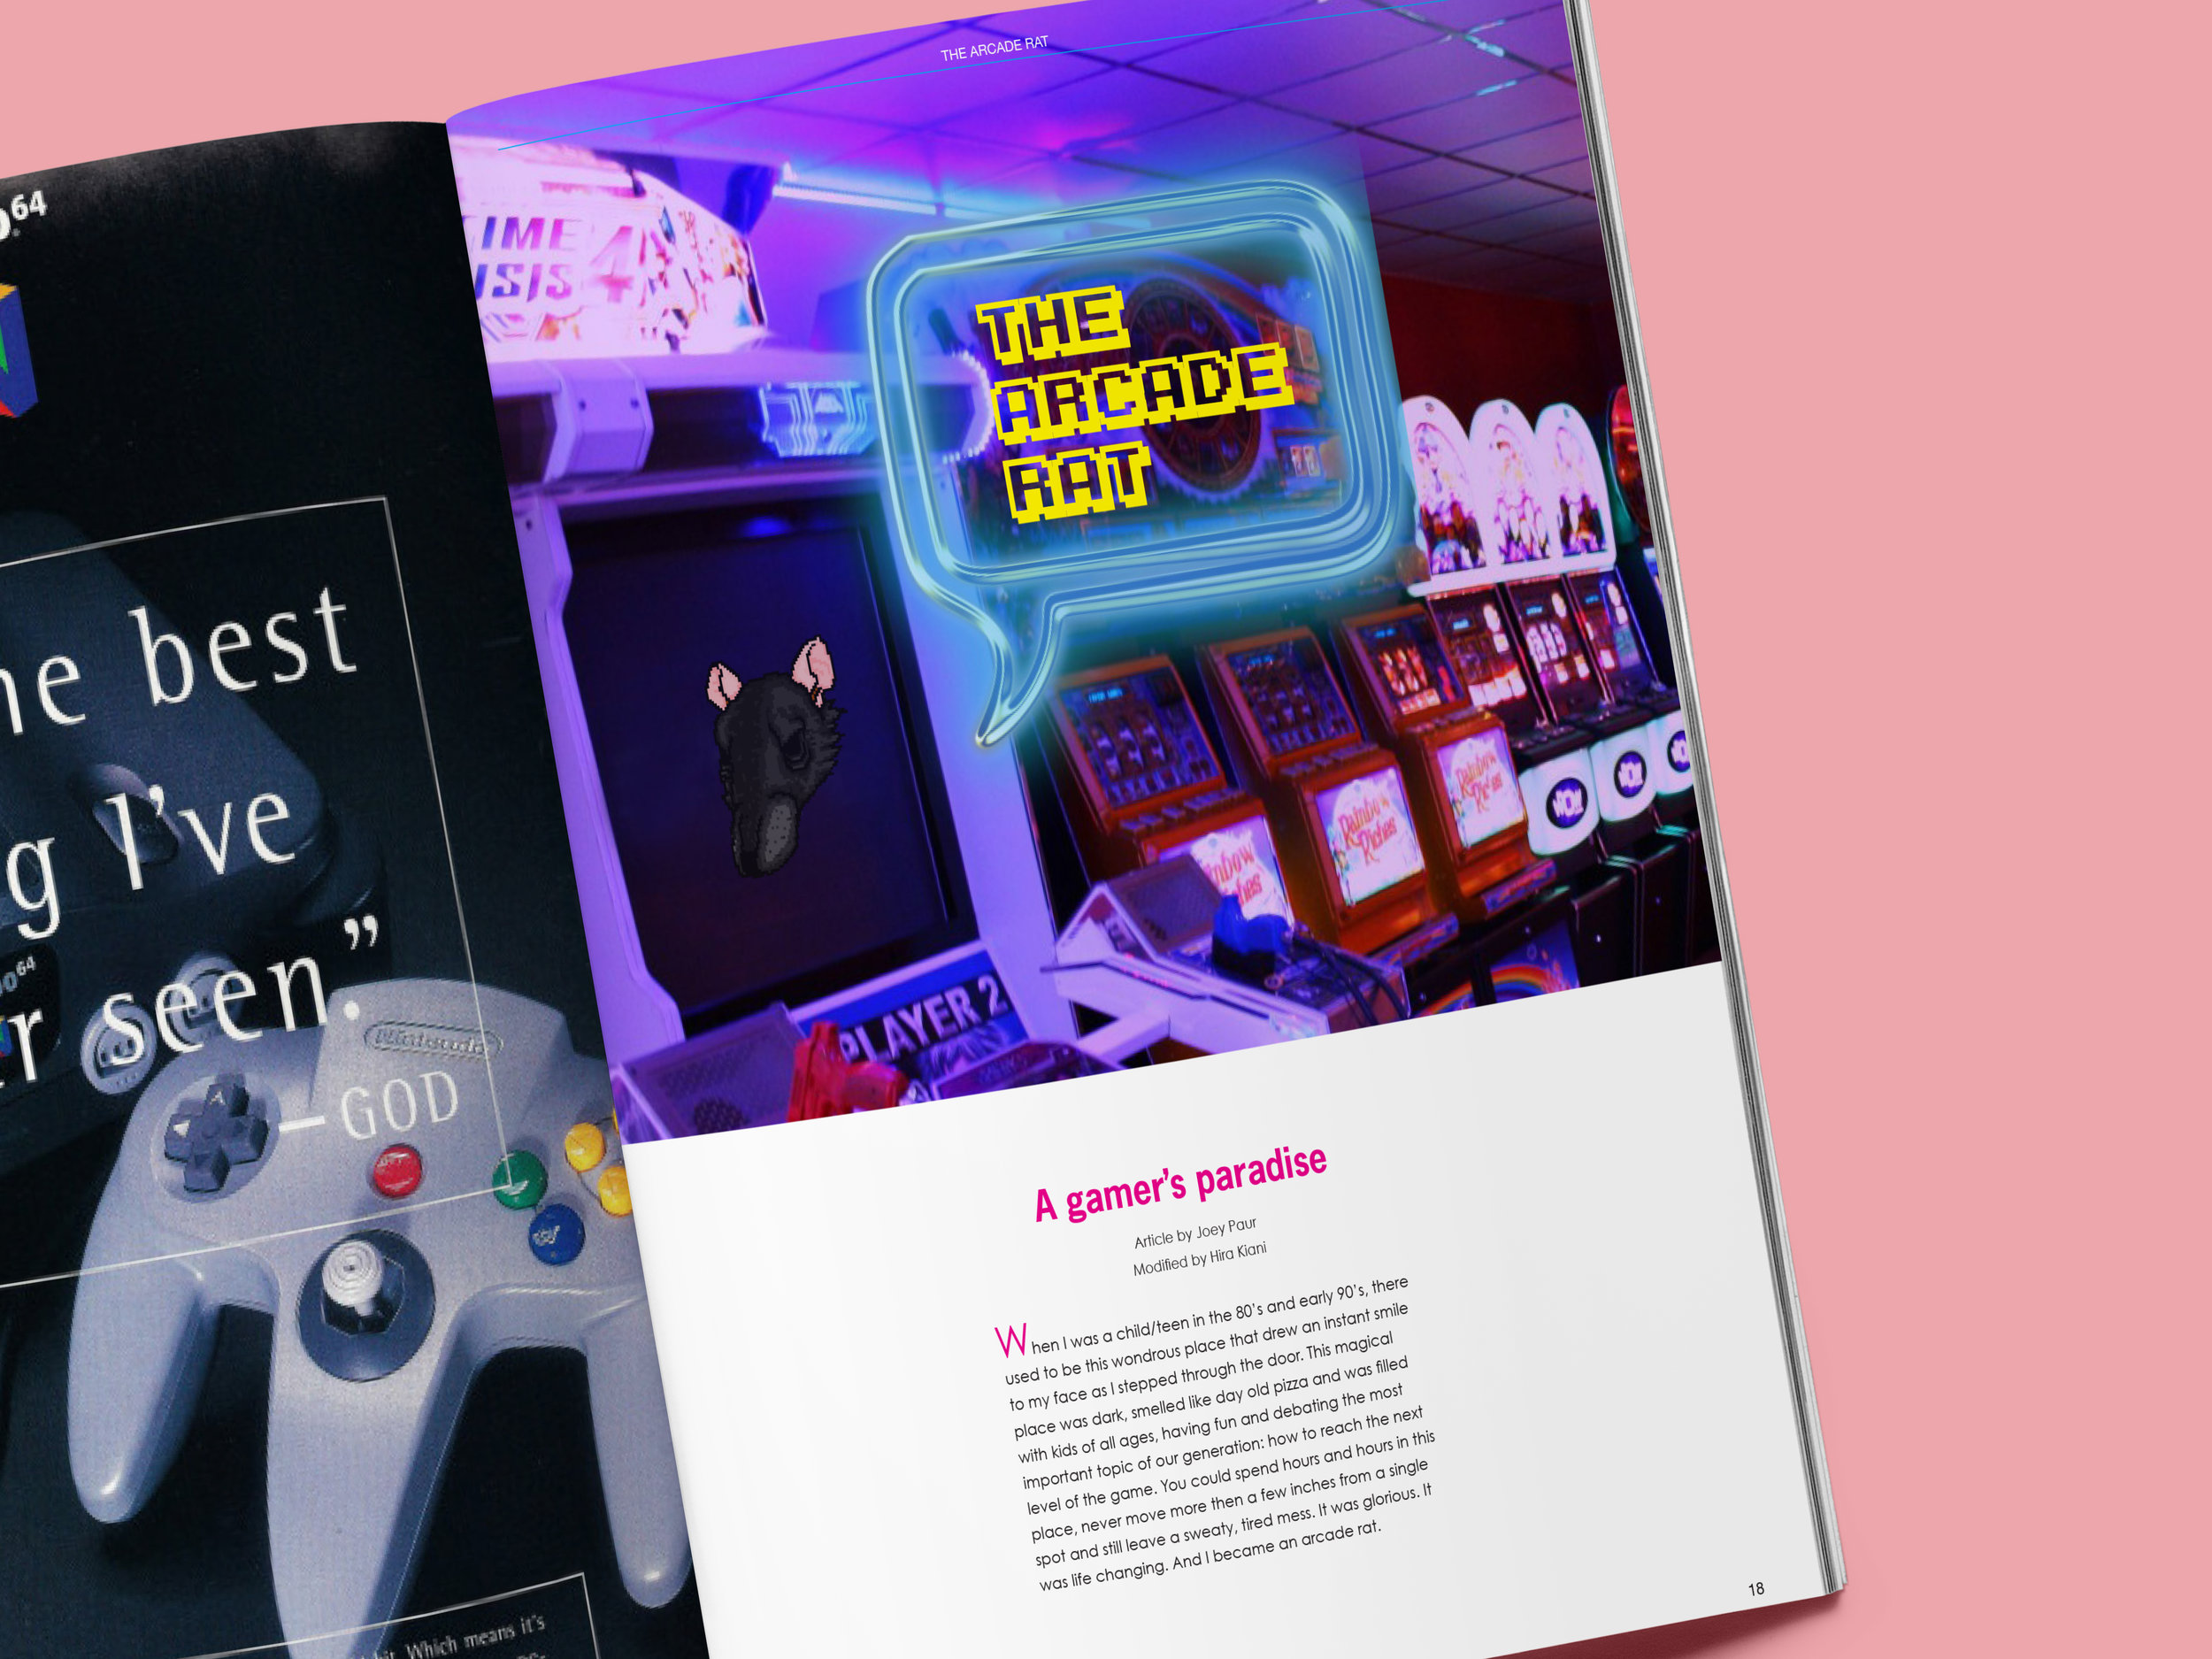 arcade-page-1.jpg